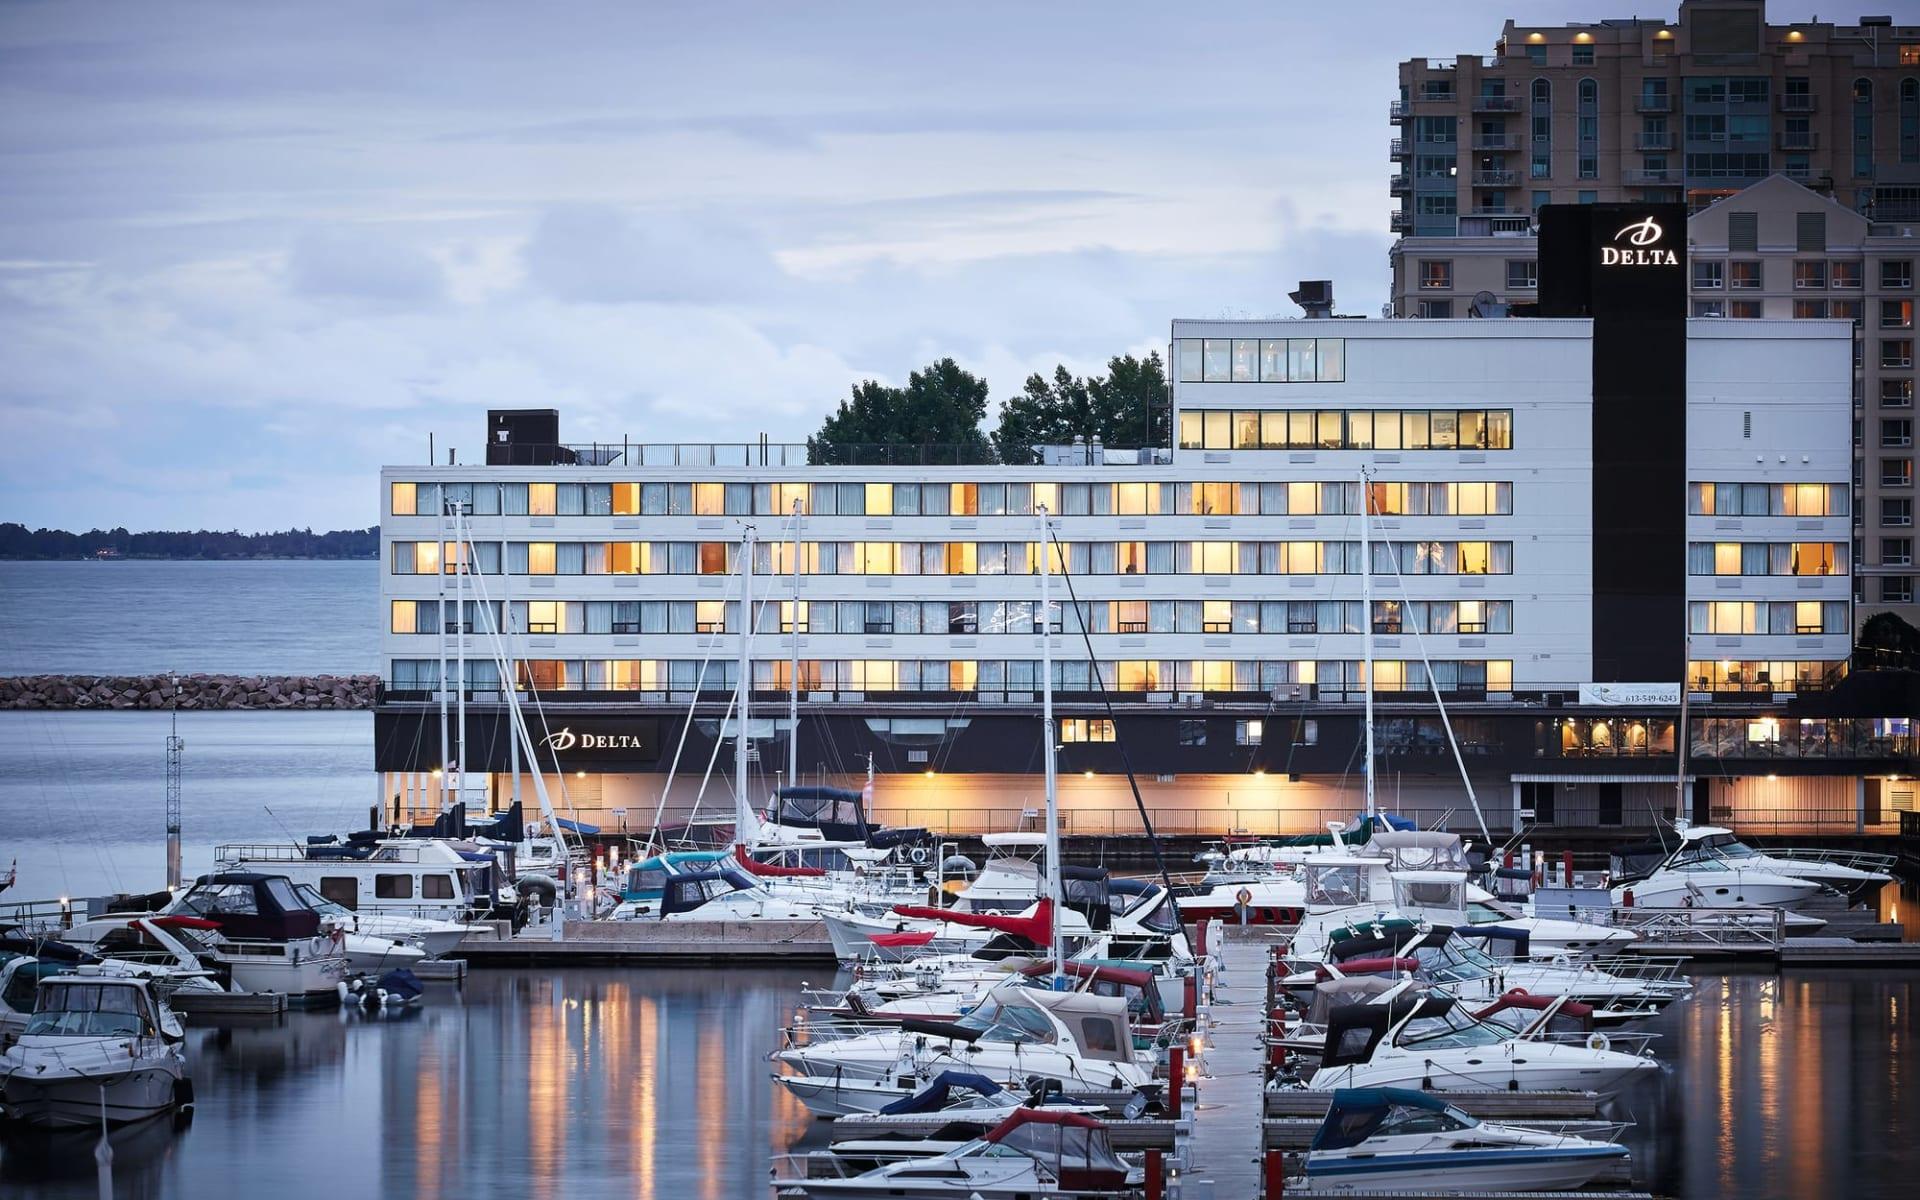 Delta Kingston Waterfront Hotel: Delta Kingston Waterfront Hotel, Kingston (ON)_Aussenansicht mit Hafen